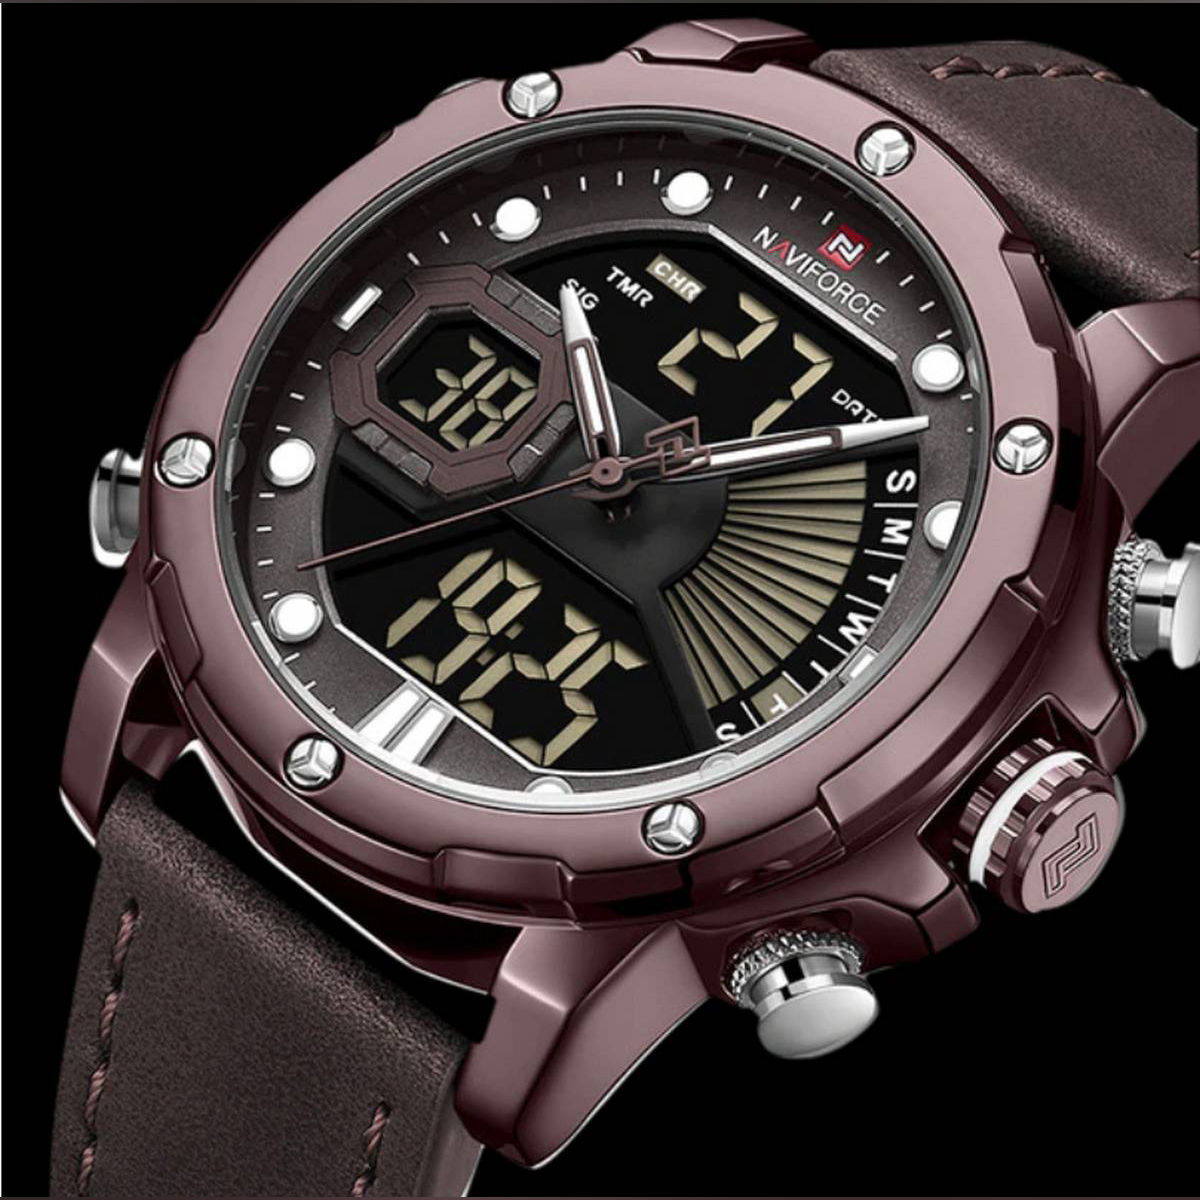 Naviforce Dual Display Japan Quartz Wrist Watch With Brand Box - NF9172L